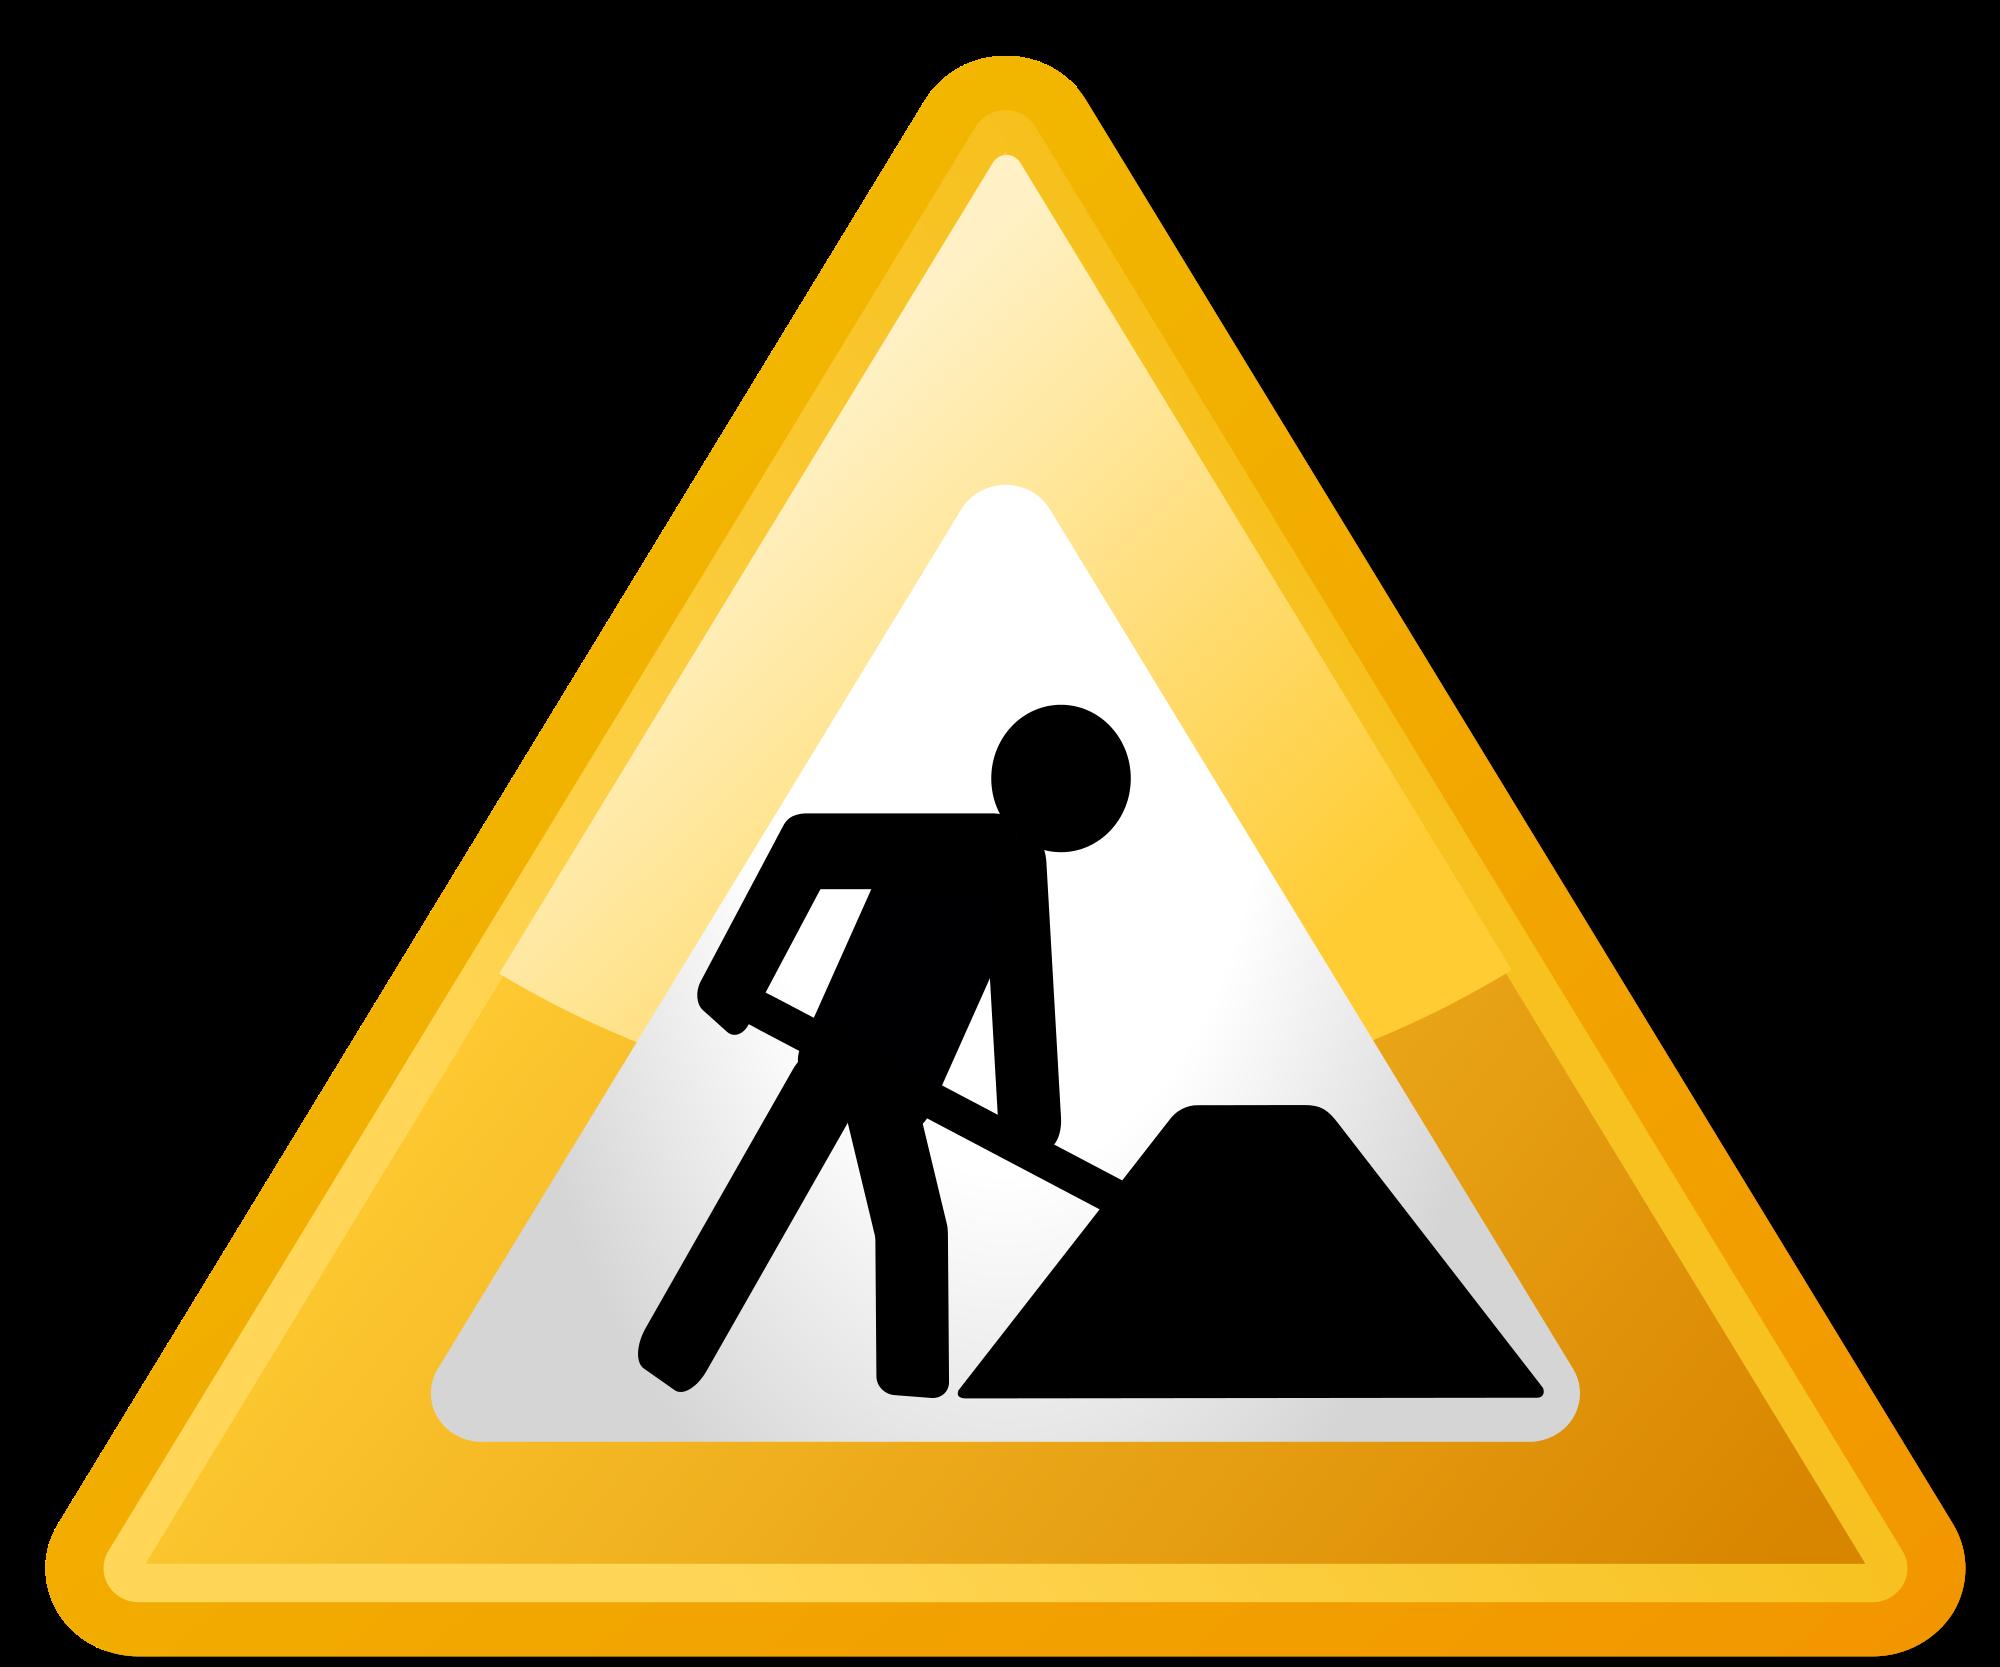 2000x1667 Fileunder Construction Icon Yellow.svg